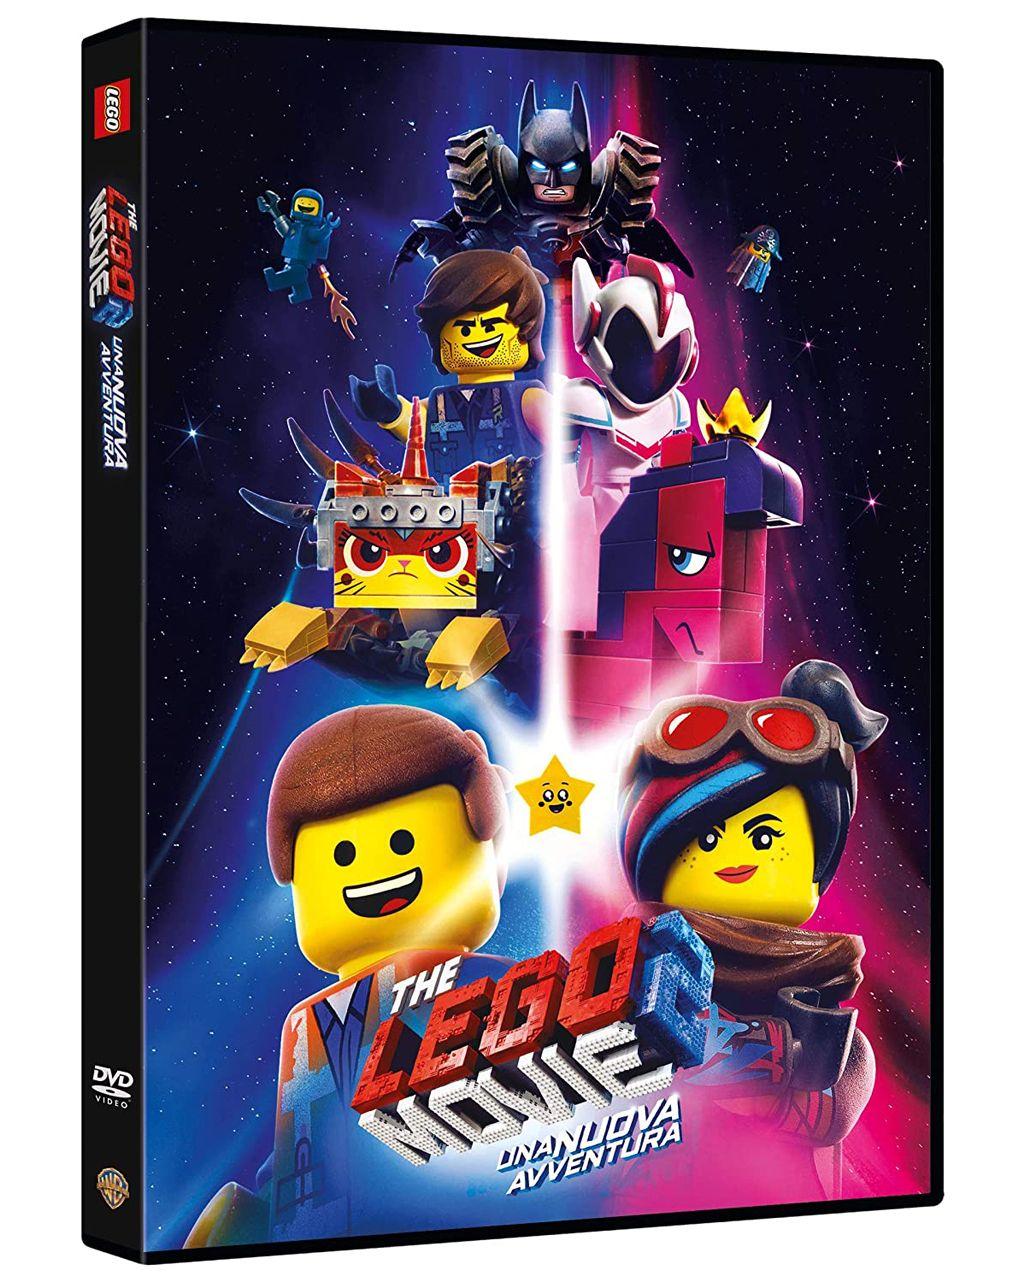 Dvd lego movie 2 (the) - uma nova aventura - Video Delta